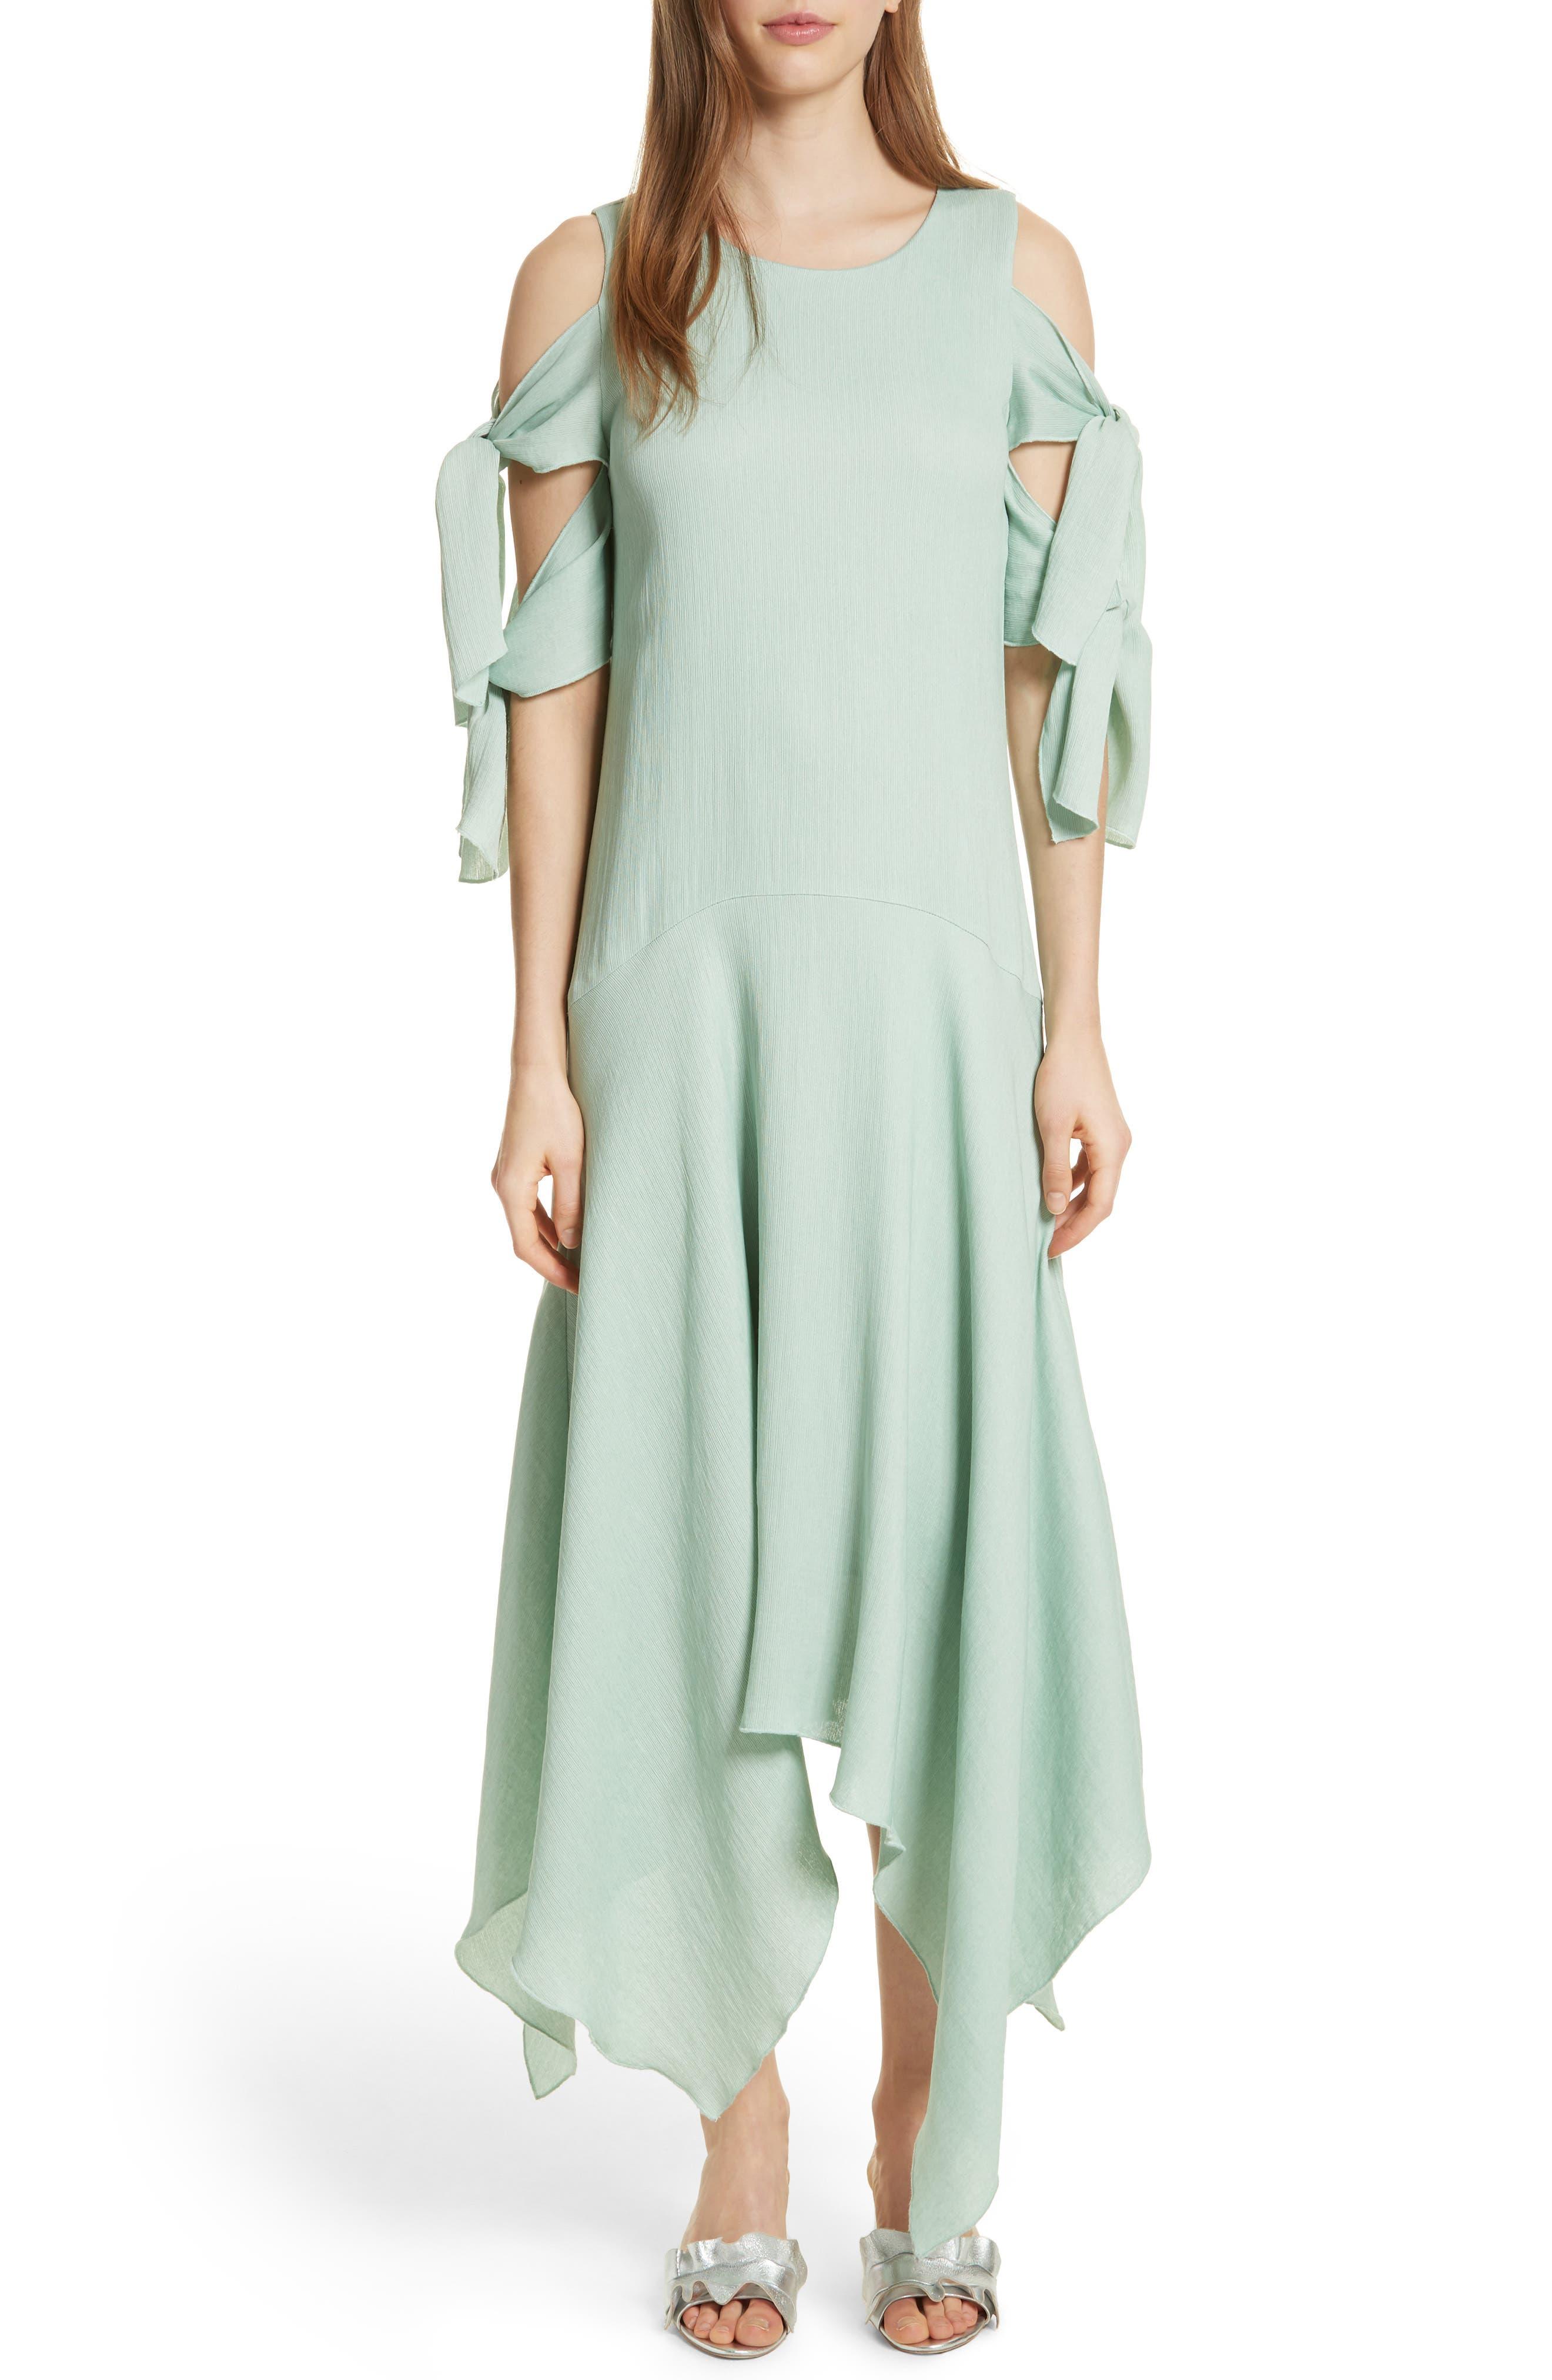 Prose & Poetry Vivianna Drop Waist Midi Dress,                             Main thumbnail 1, color,                             332